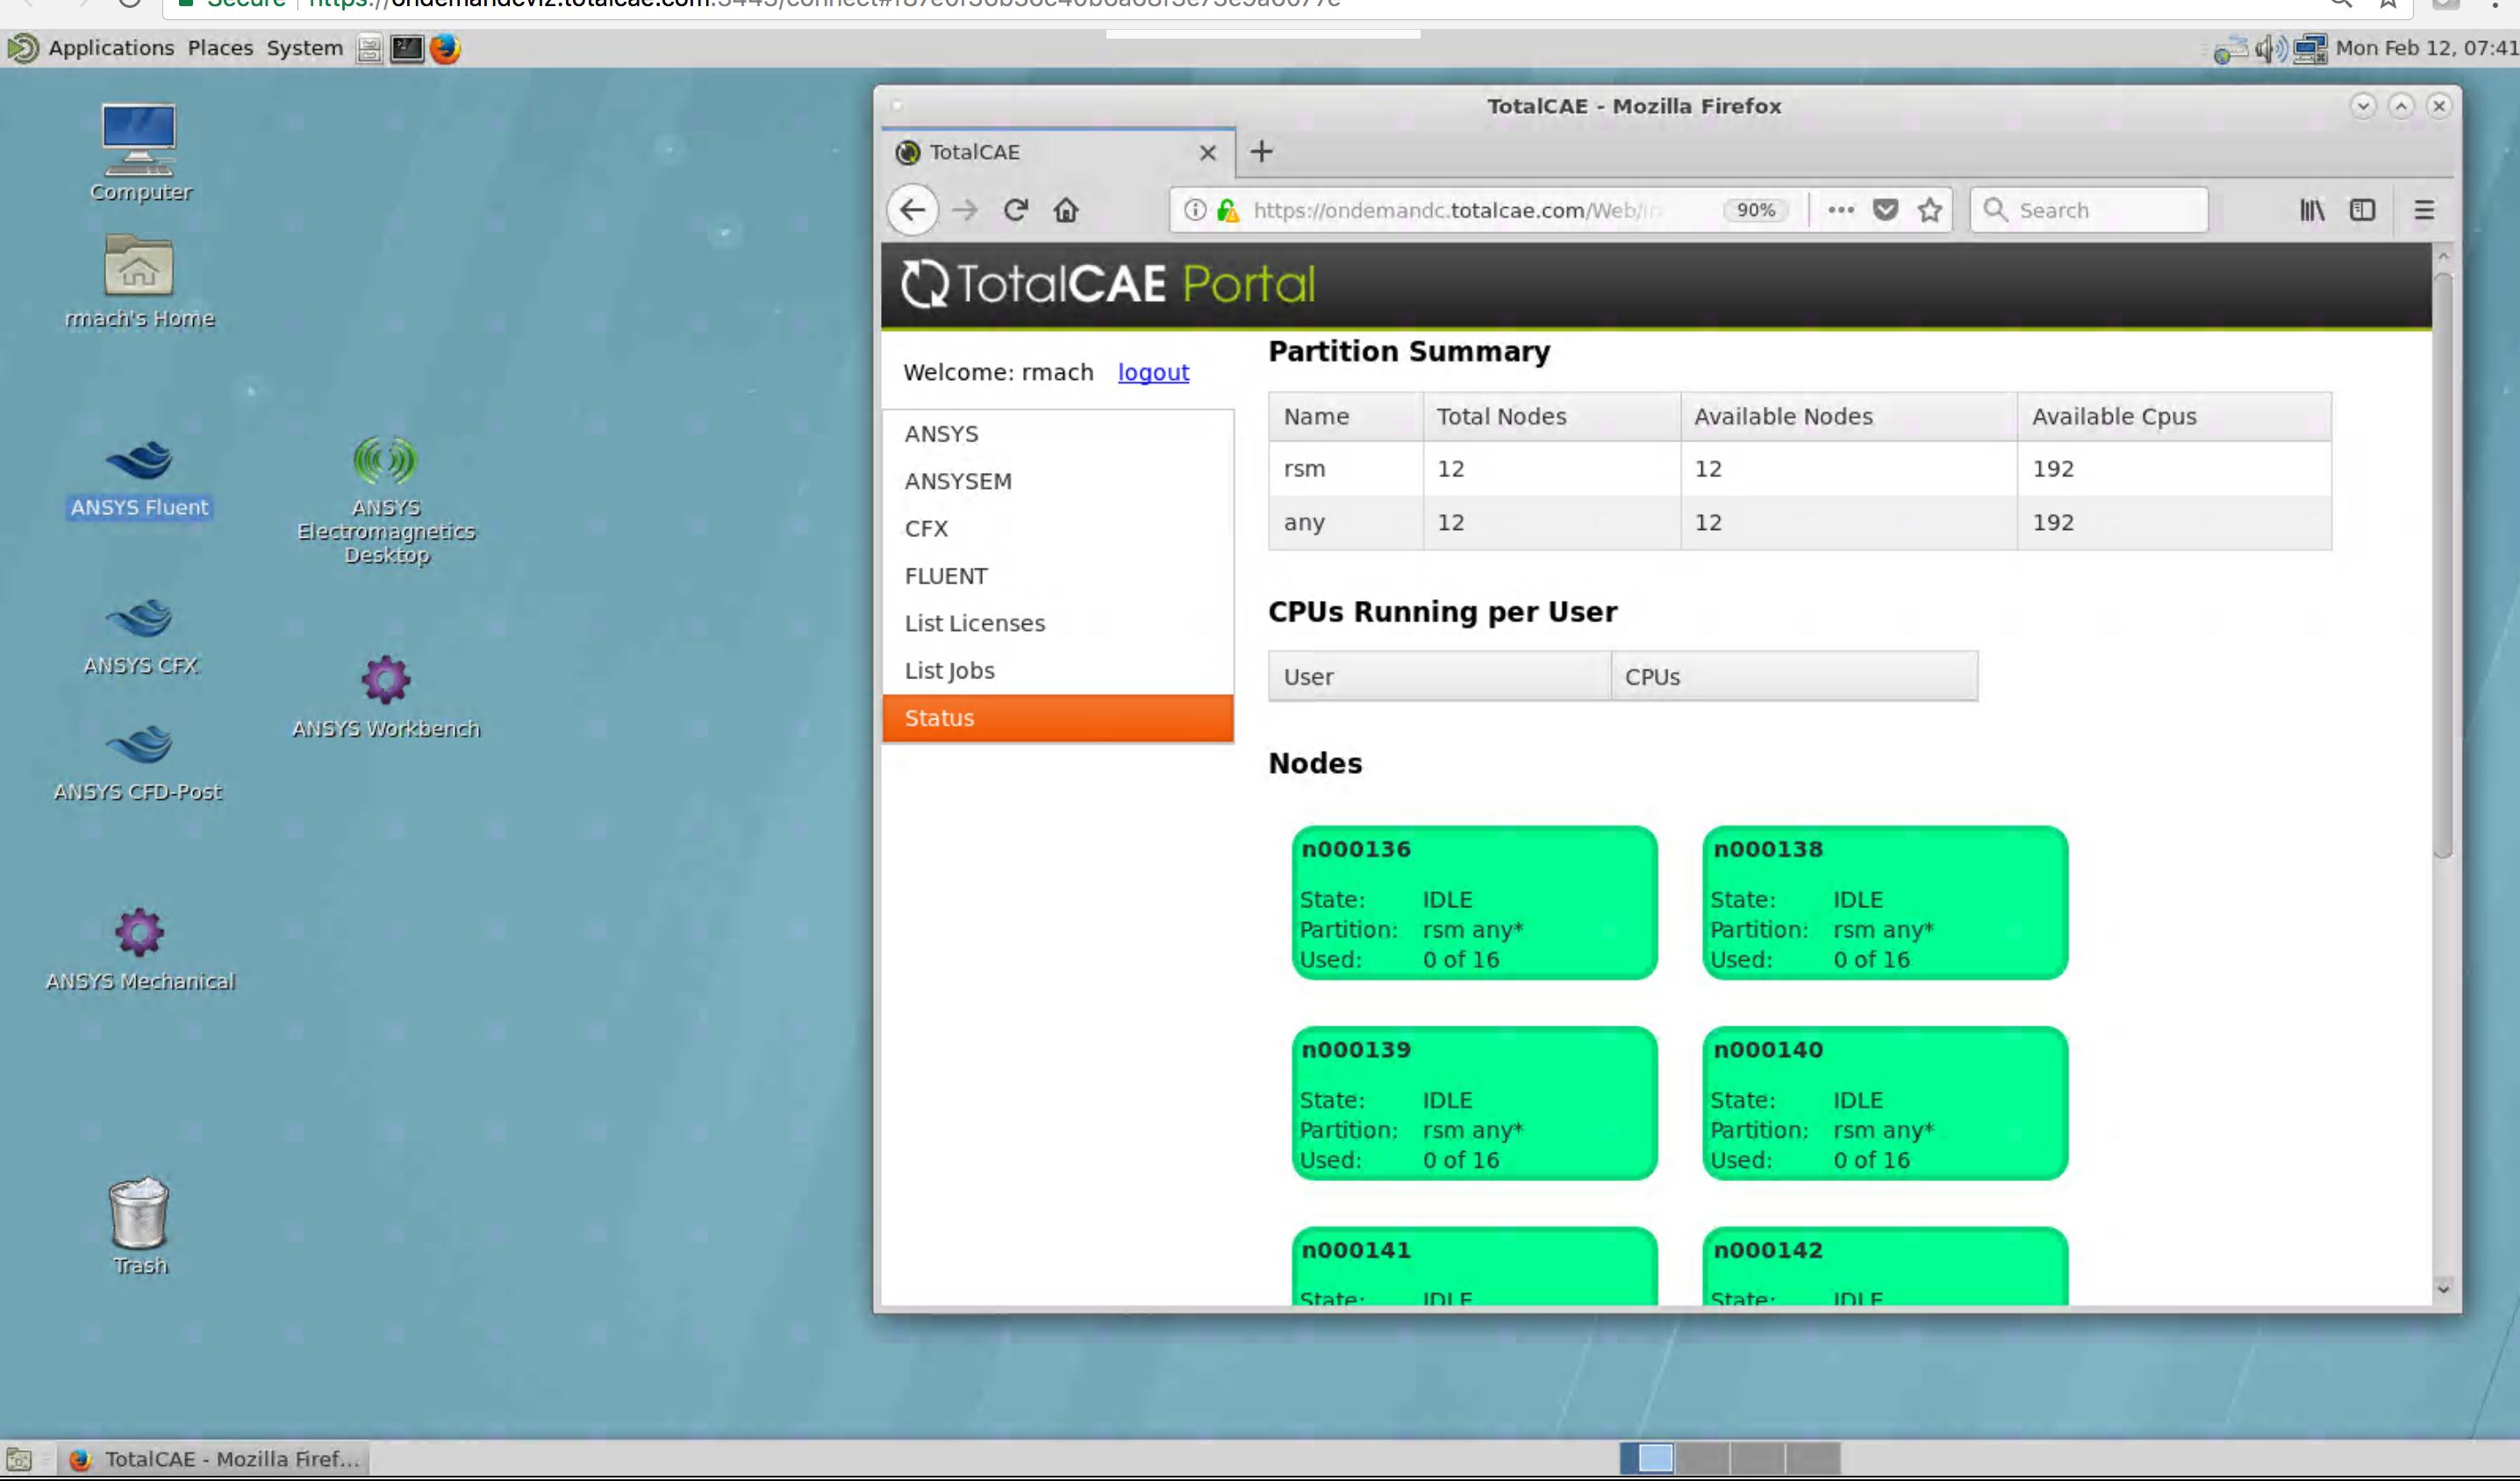 TotalCAE Remote Viz for ANSYS Fluent